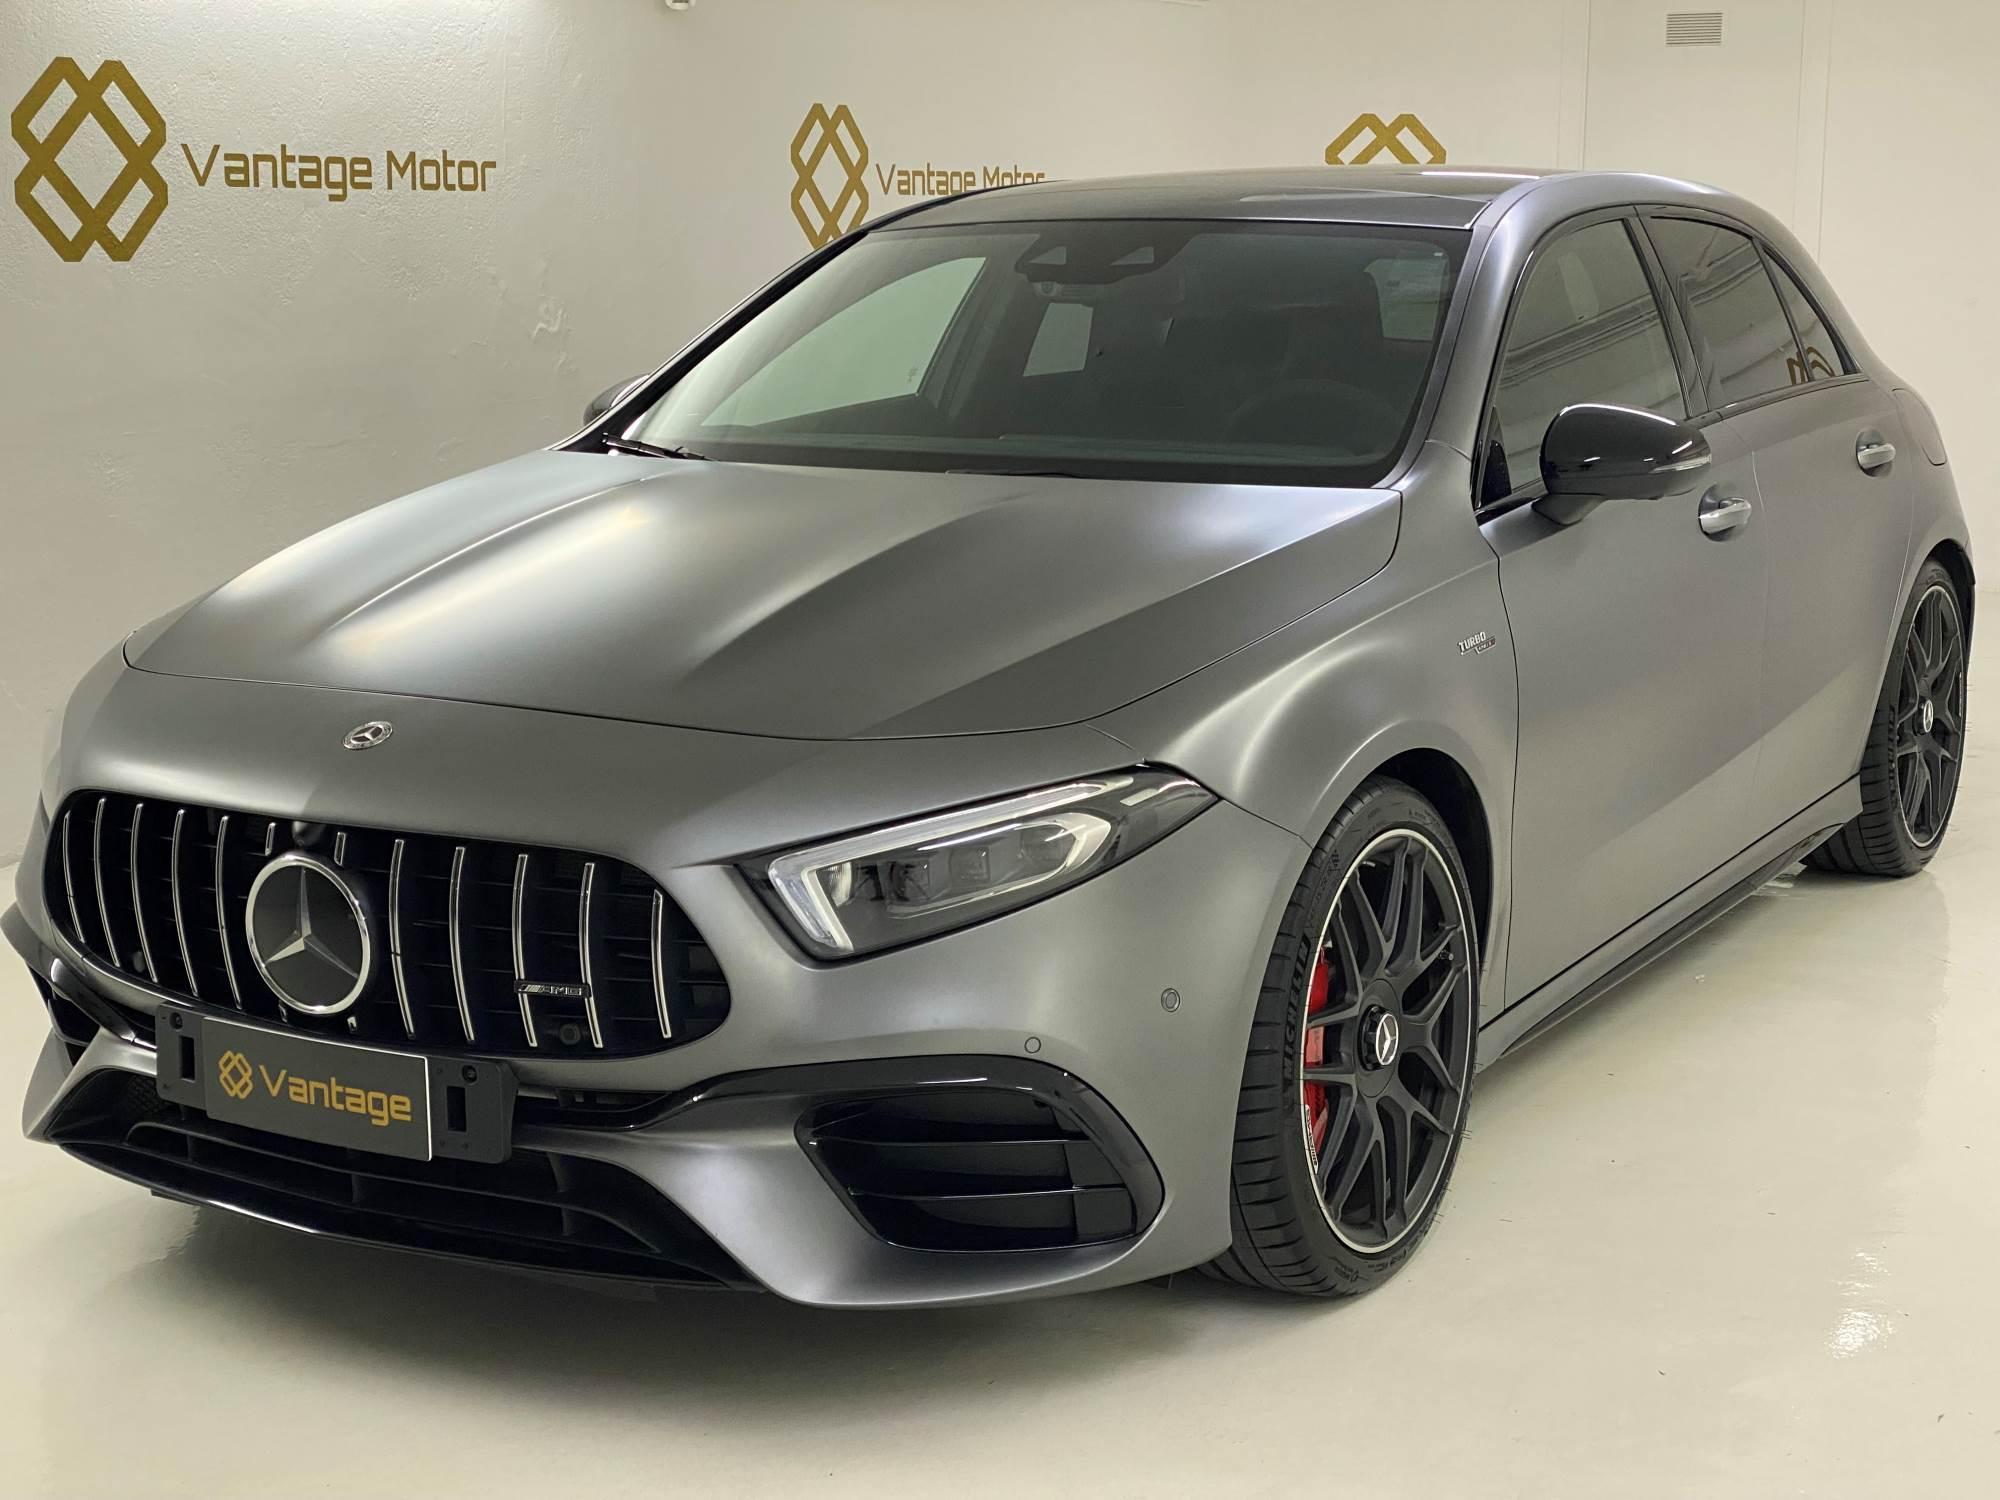 Mercedes-Benz - AMG A 45 S 4MATIC   Benzina  2020  21.900 Km